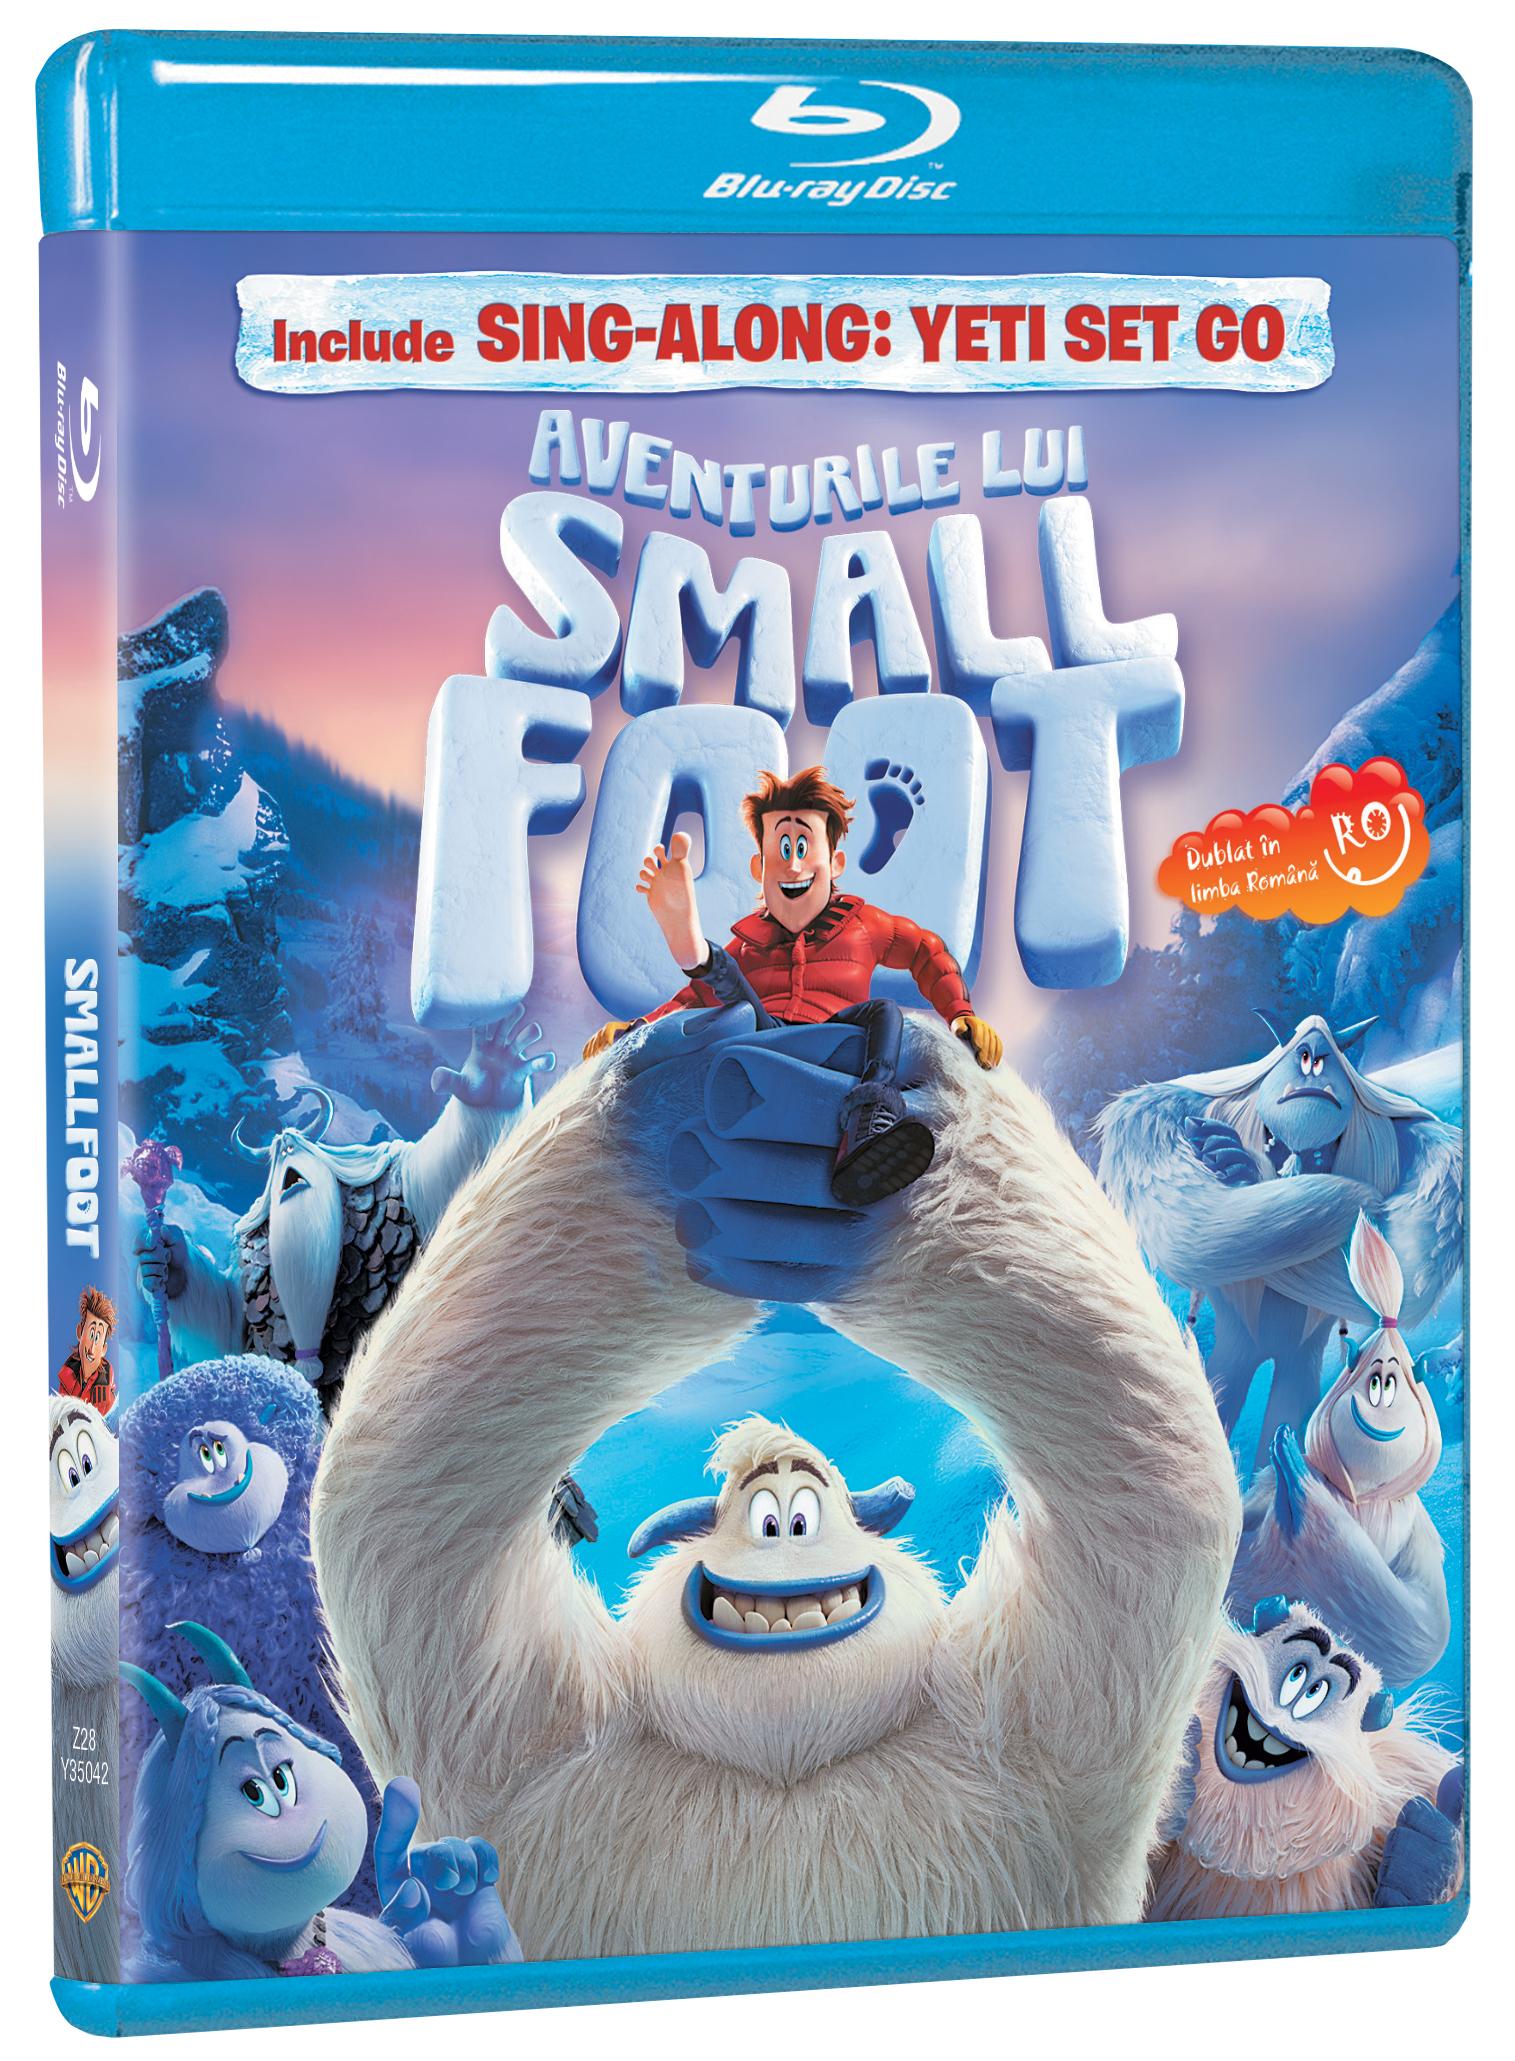 pro video a lansat aventurile lui smallfoot, format dvd, blu-ray si 3dbd Pro Video a lansat filmul de animatie Aventurile lui Smallfoot, format DVD, Blu-Ray si 3DBD SmallFoot BD 3D pack